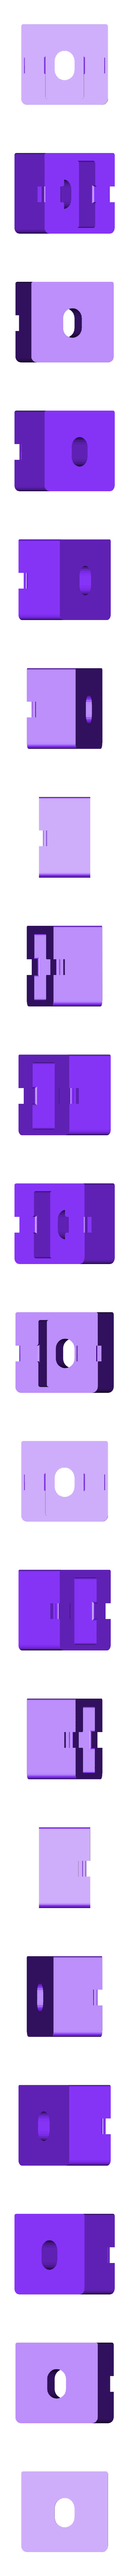 Parte_superior_husillo_con_muelle_eje_Z_para_perfil_aluminio_2040.stl Télécharger fichier STL gratuit Parte Superior Husillo eje Z con muelle para perfil de aluminio 2040 • Plan imprimable en 3D, celtarra12